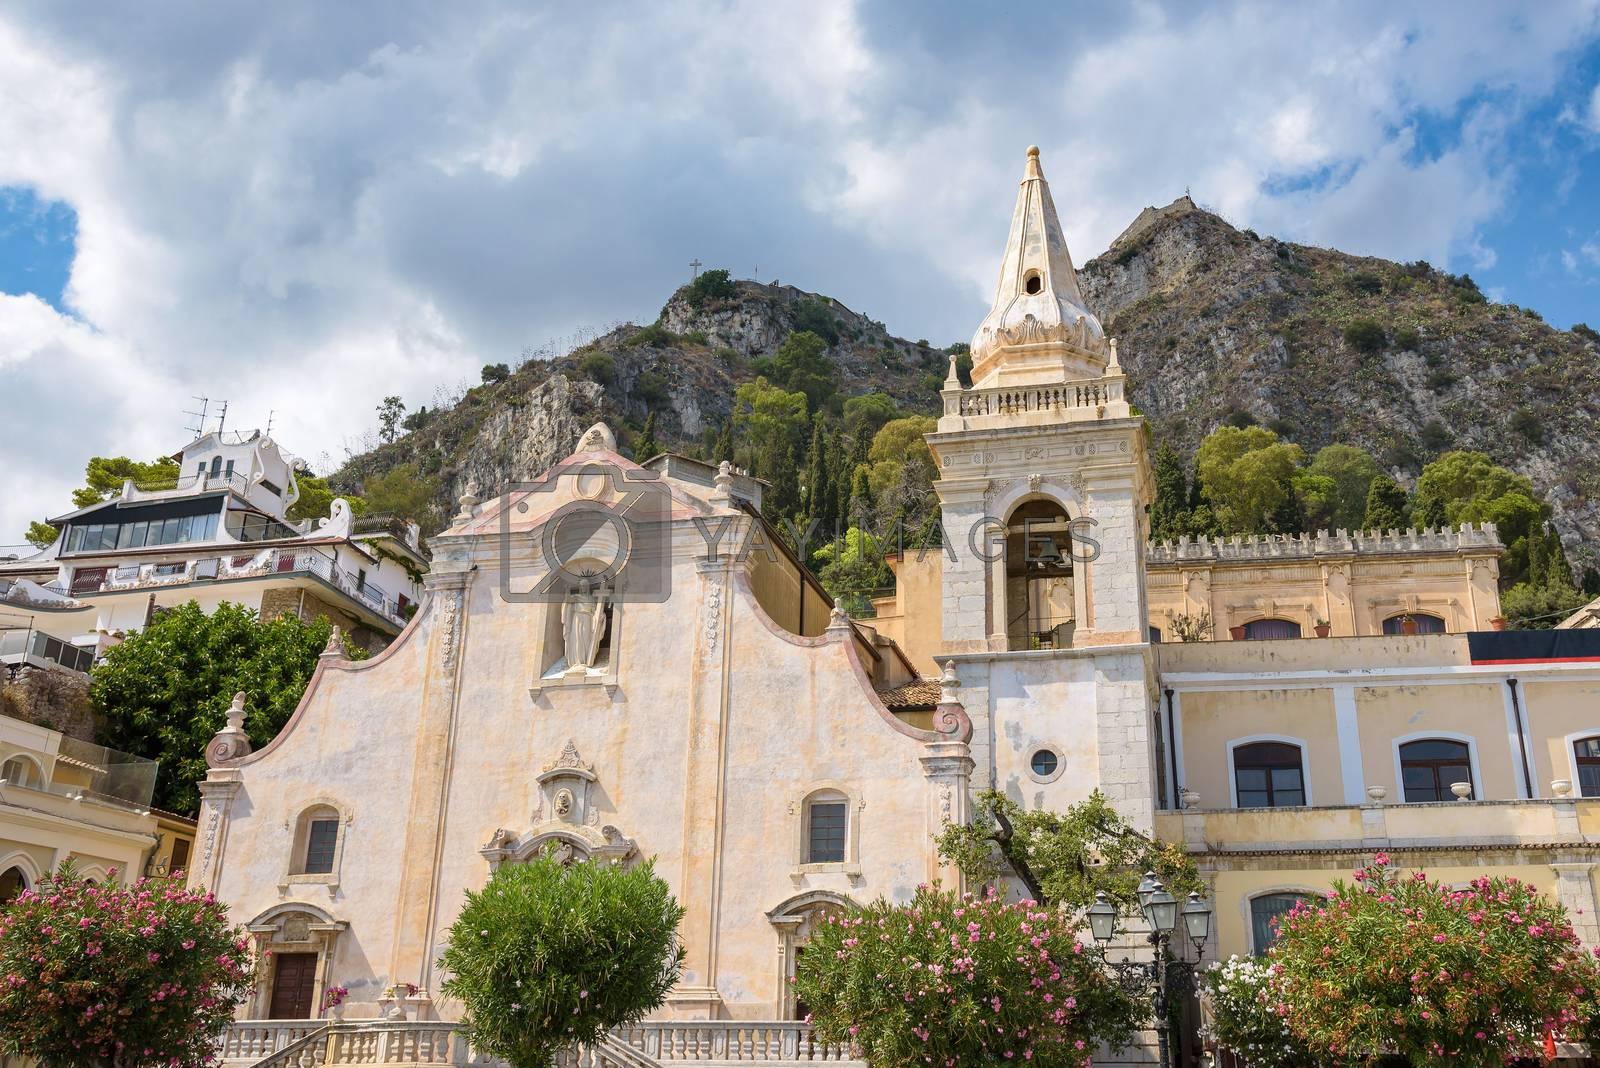 Church of San Giuseppe in Taormina, Sicily, Italy